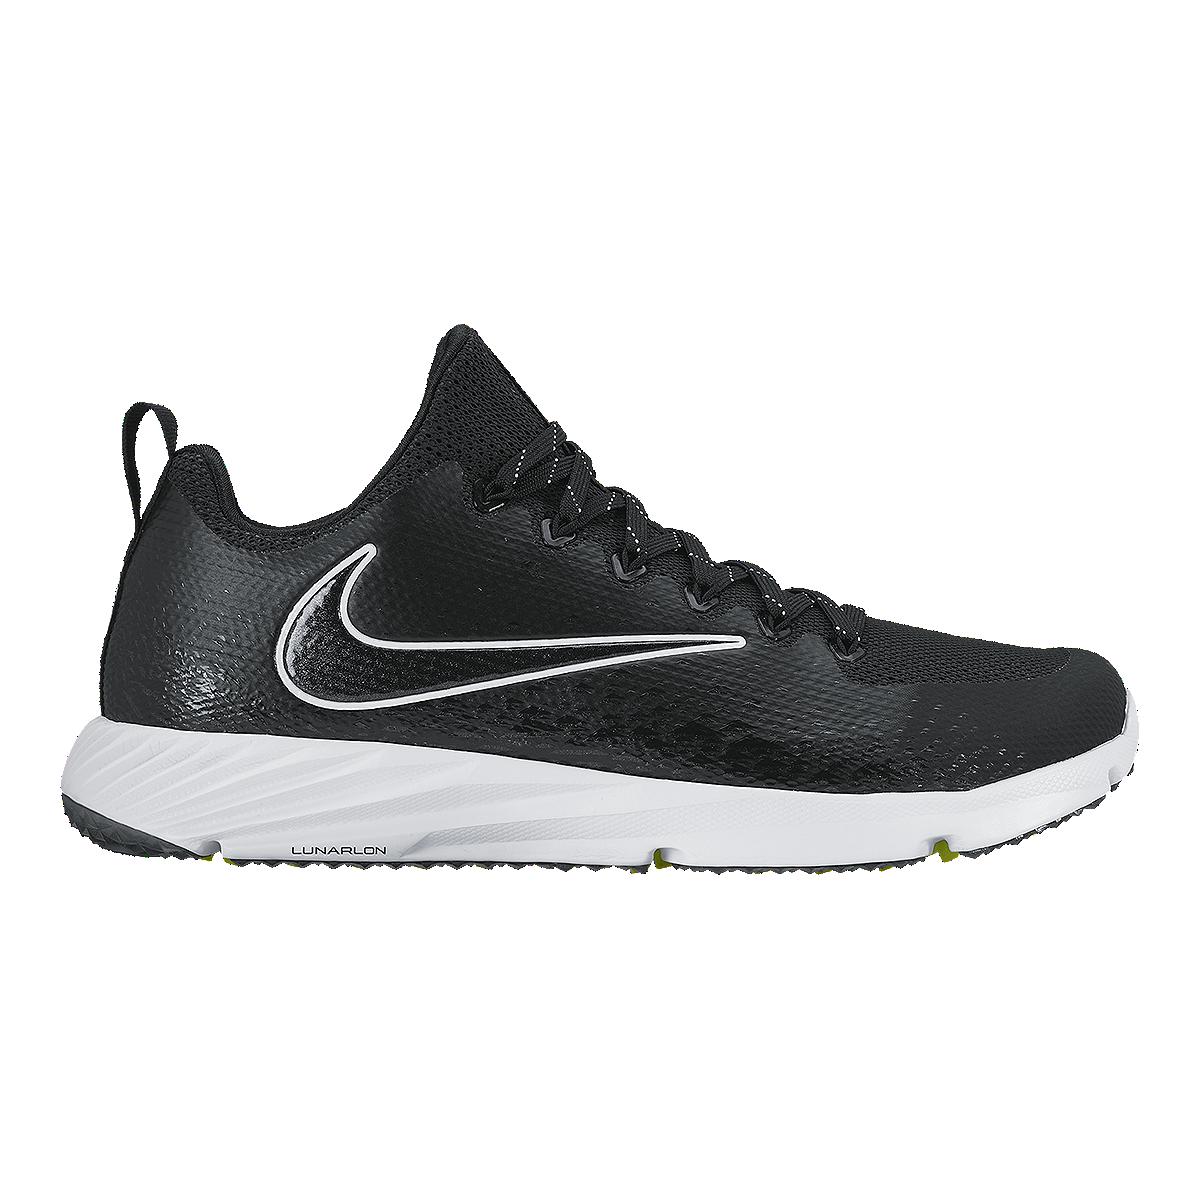 932c329c54 Nike Men's Vapor Speed Turf Football Cleats - Black/White   Sport Chek